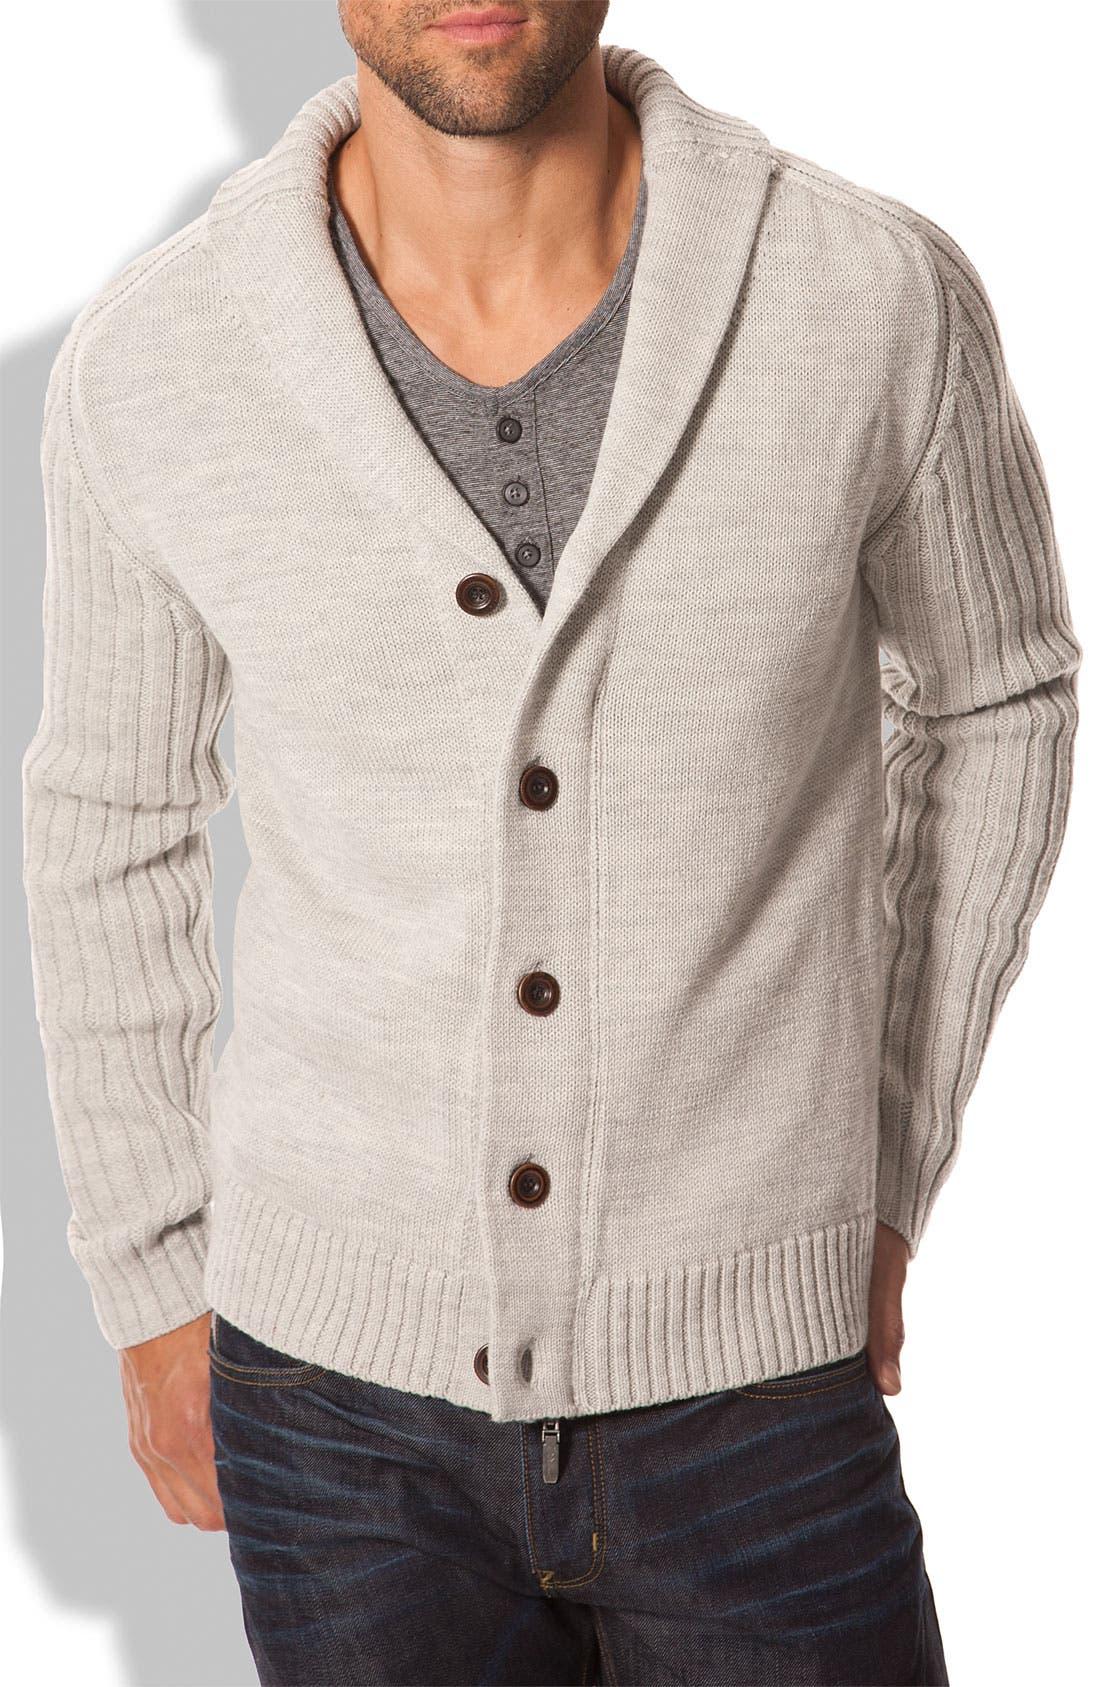 Alternate Image 1 Selected - 7 Diamonds 'Karlstad' Cardigan Sweater